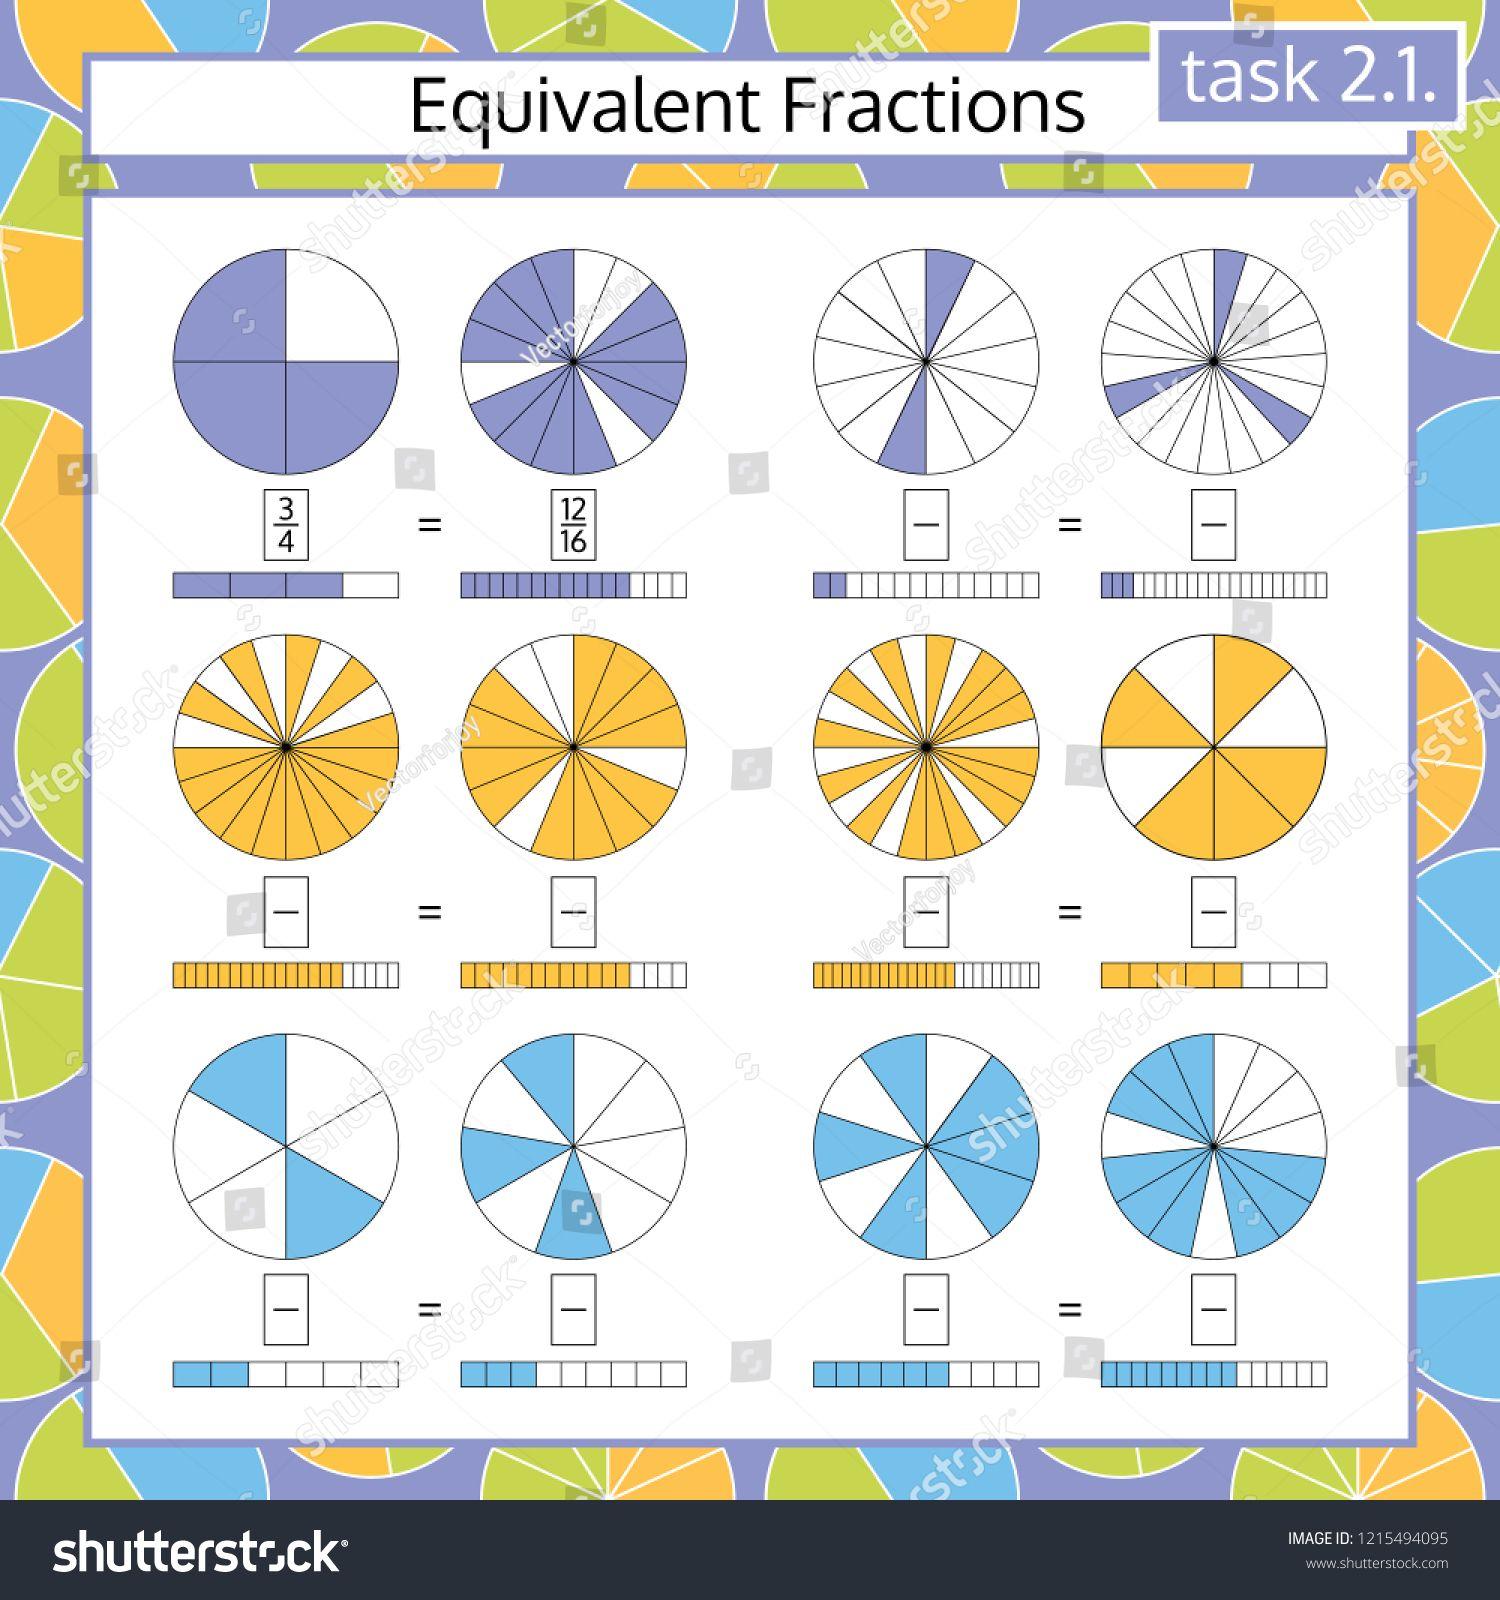 Equivalent Fractions Mathematical Worksheet Circles Math